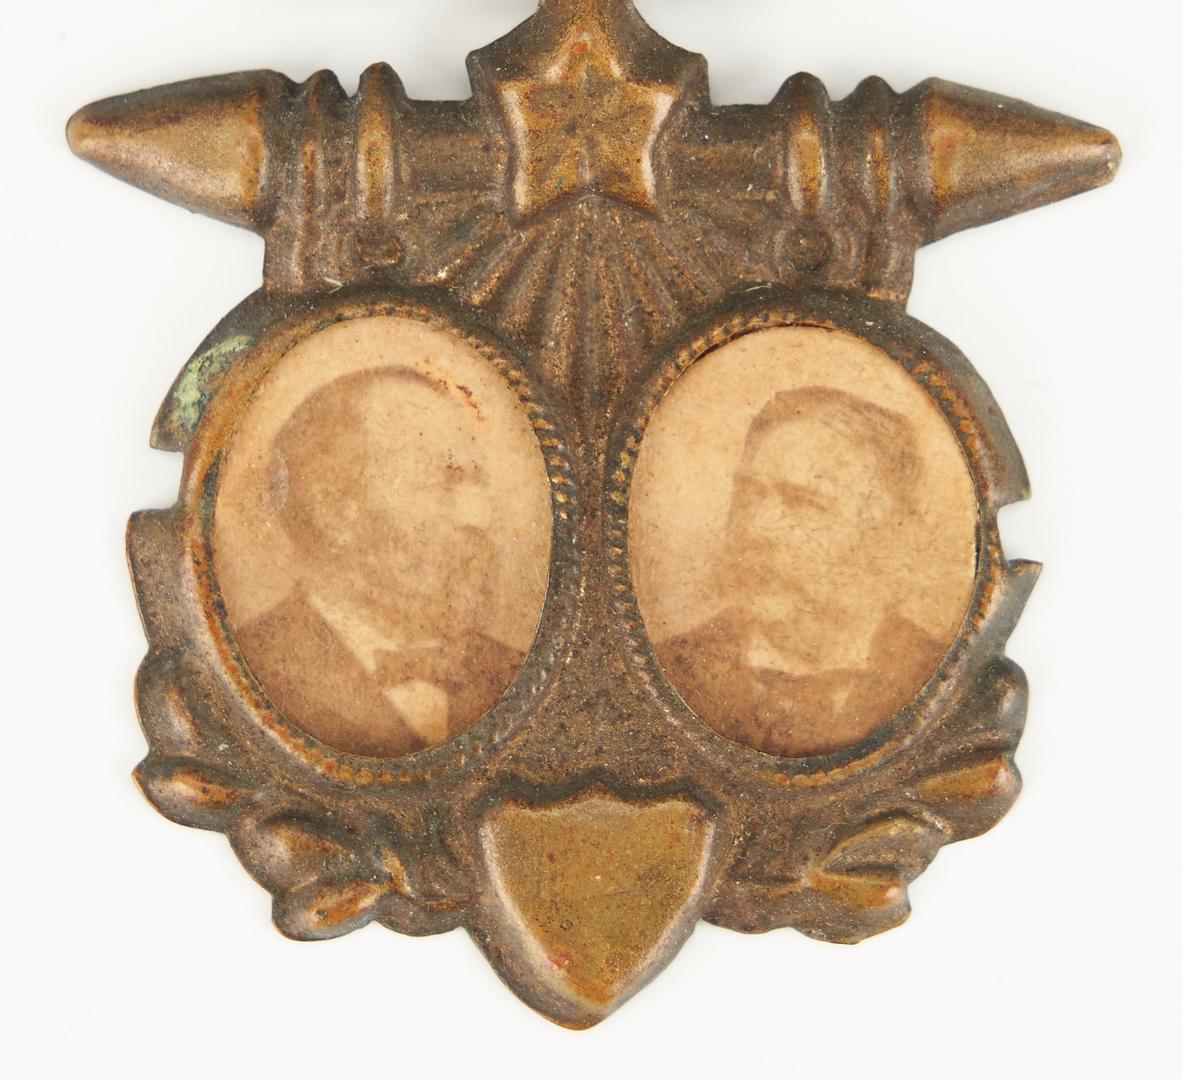 Lot 662: Garfield & Arthur Cardboard Jugate Badge